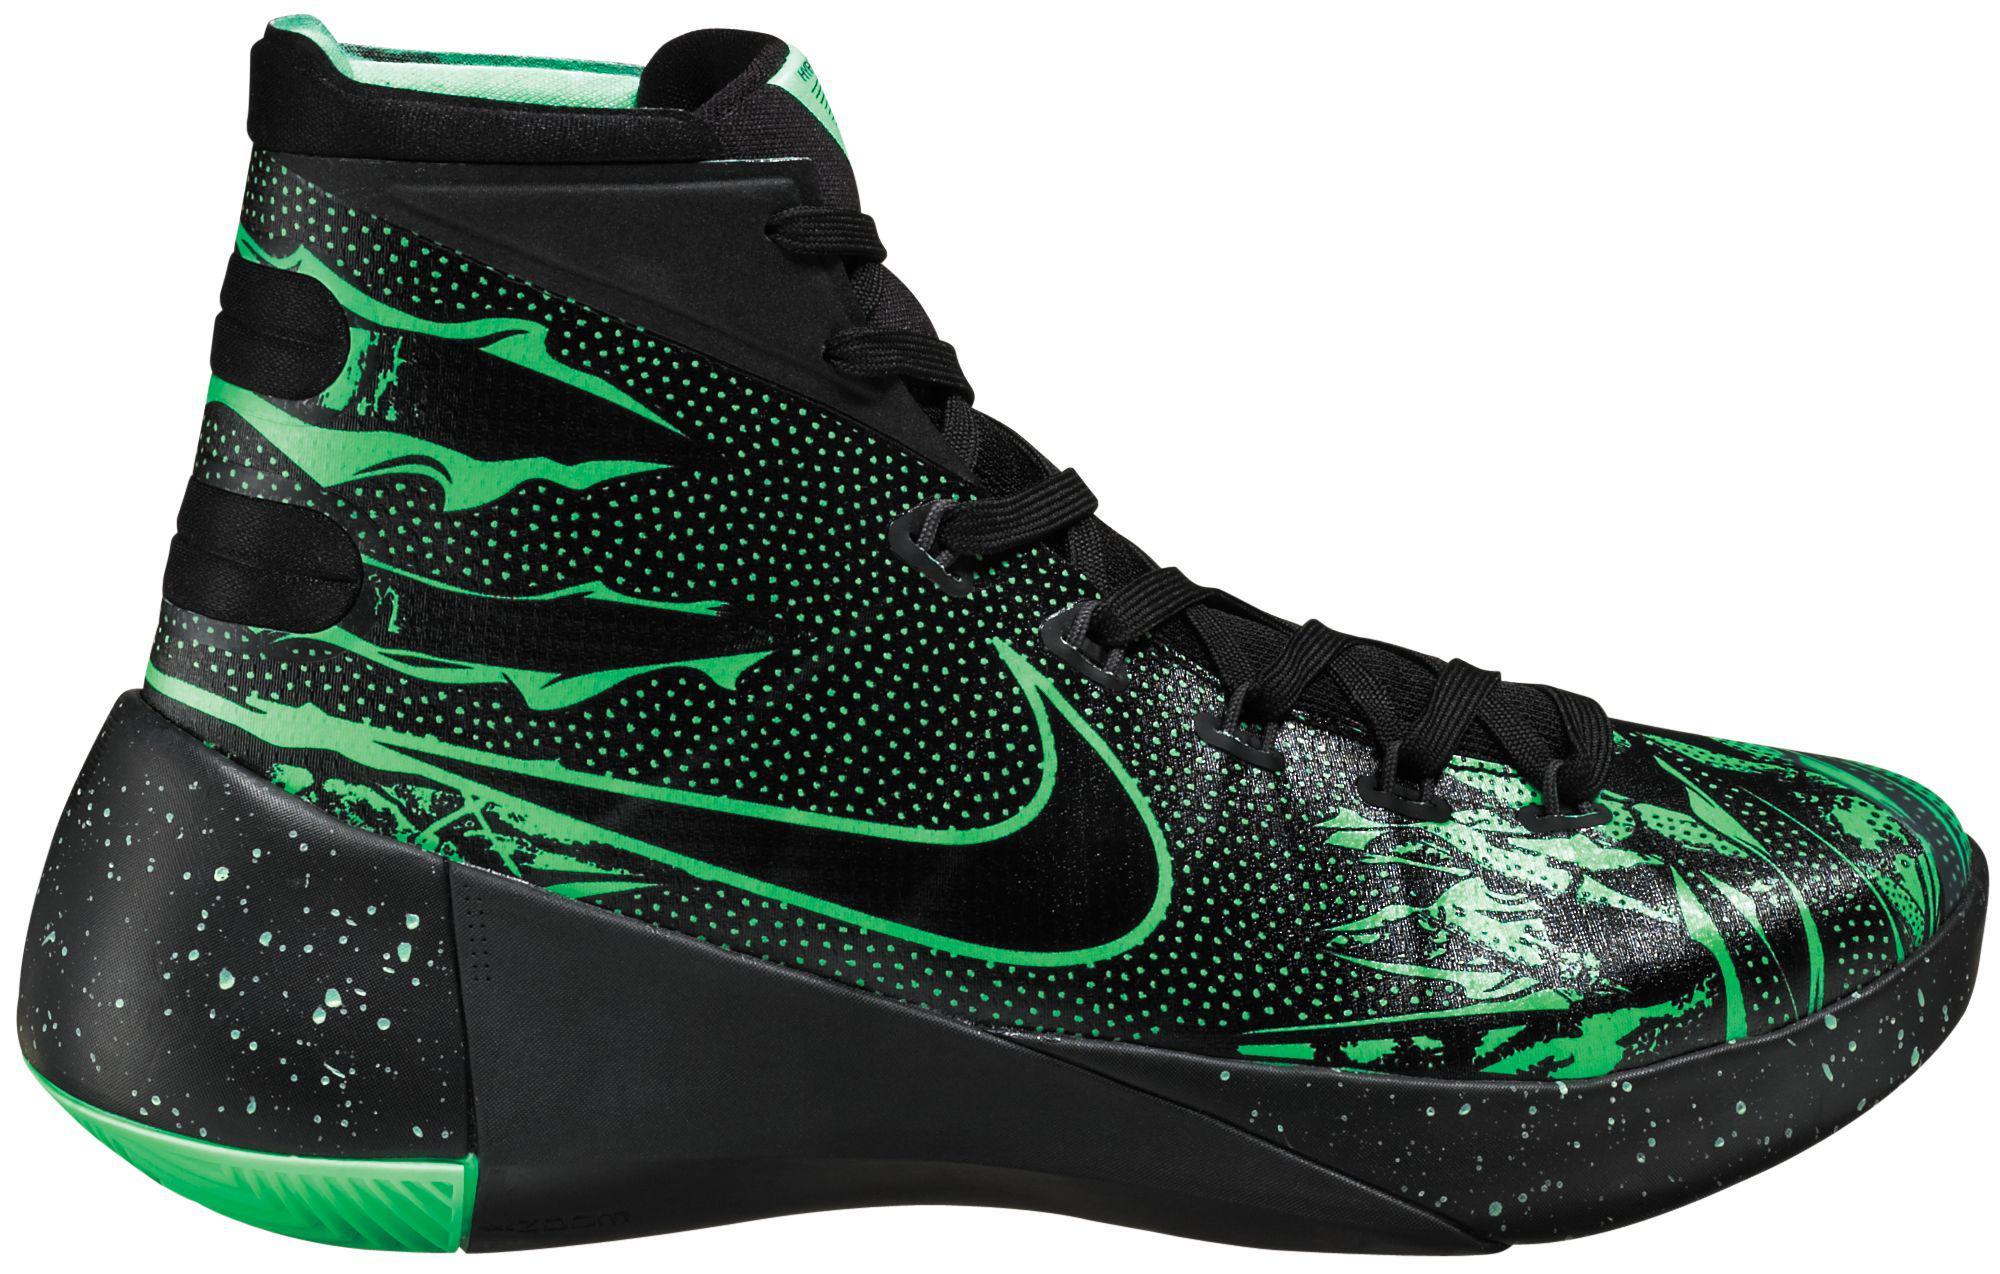 a90907d518b1 Lyst - Nike Hyperdunk 2015 Premium Basketball Shoes in Black for Men